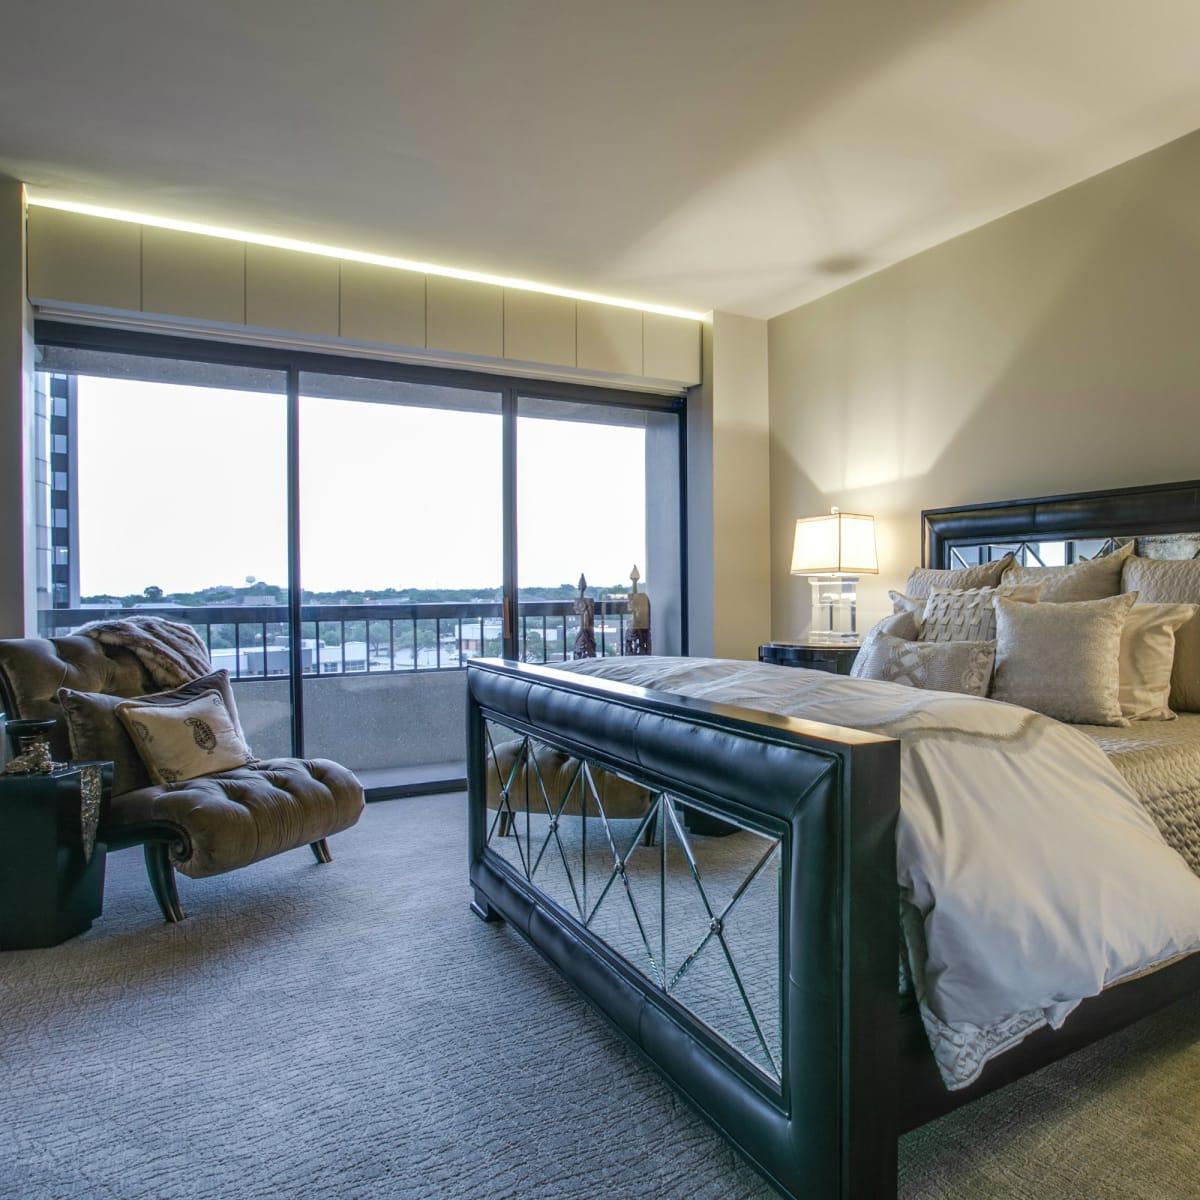 Bedroom at 3831 Turtle Creek Blvd. in Dallas